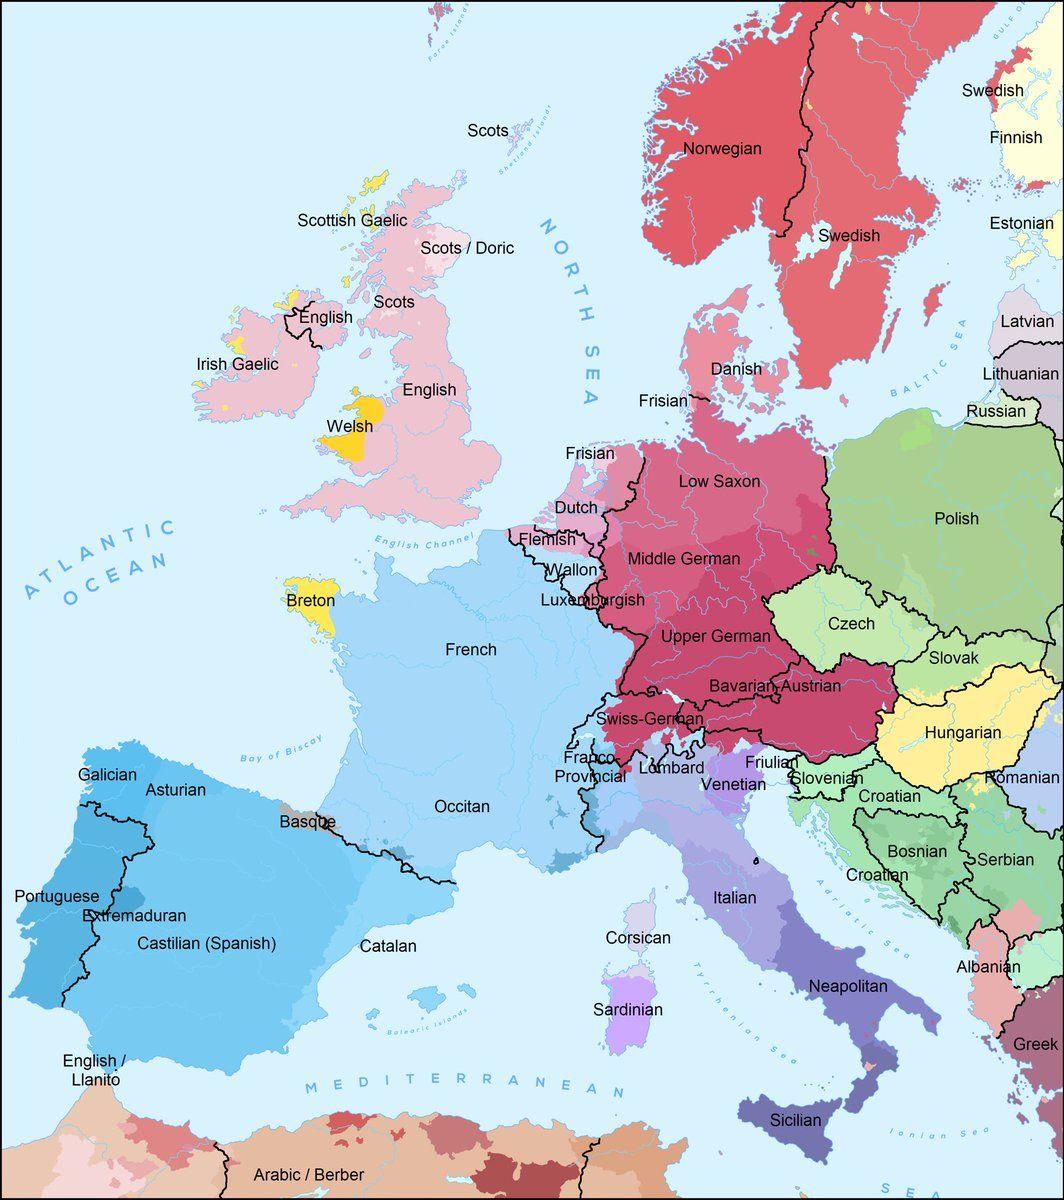 western and central europe map UK Language Maps on Twitter | Language map, Irish gaelic, Country maps